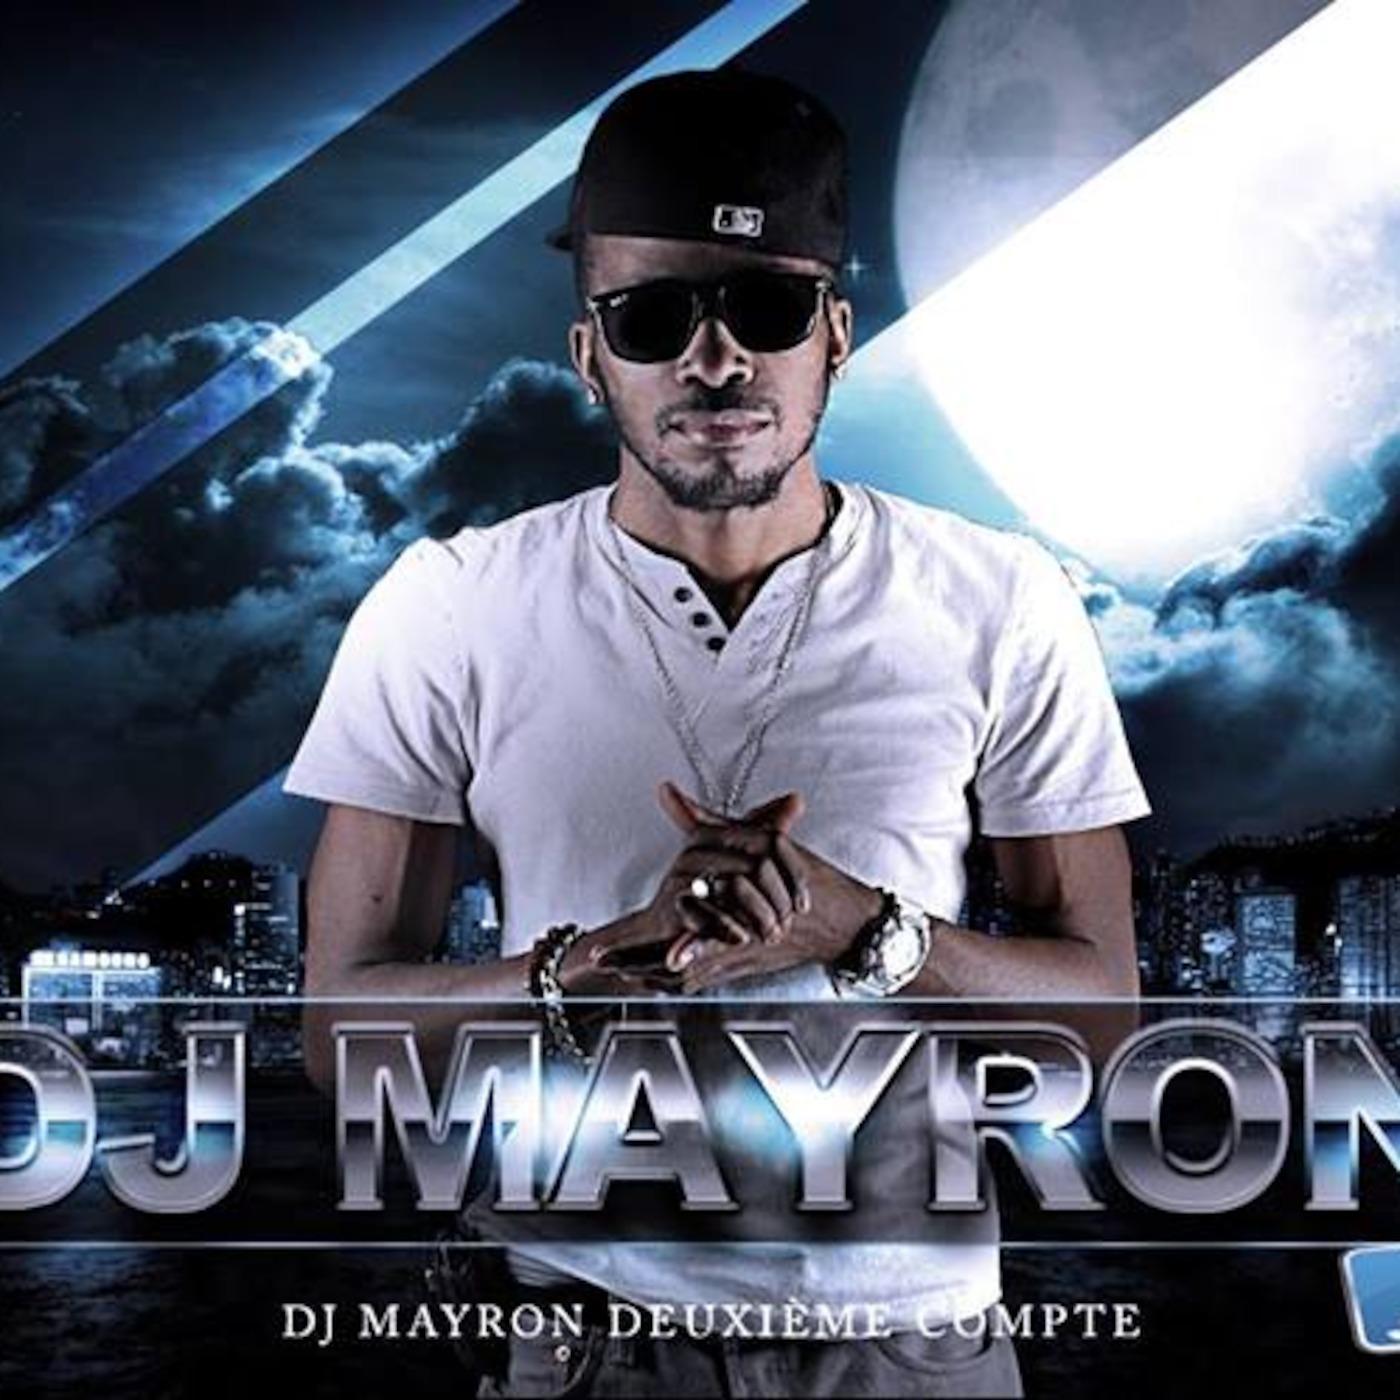 Dj Mayron's Mixtape